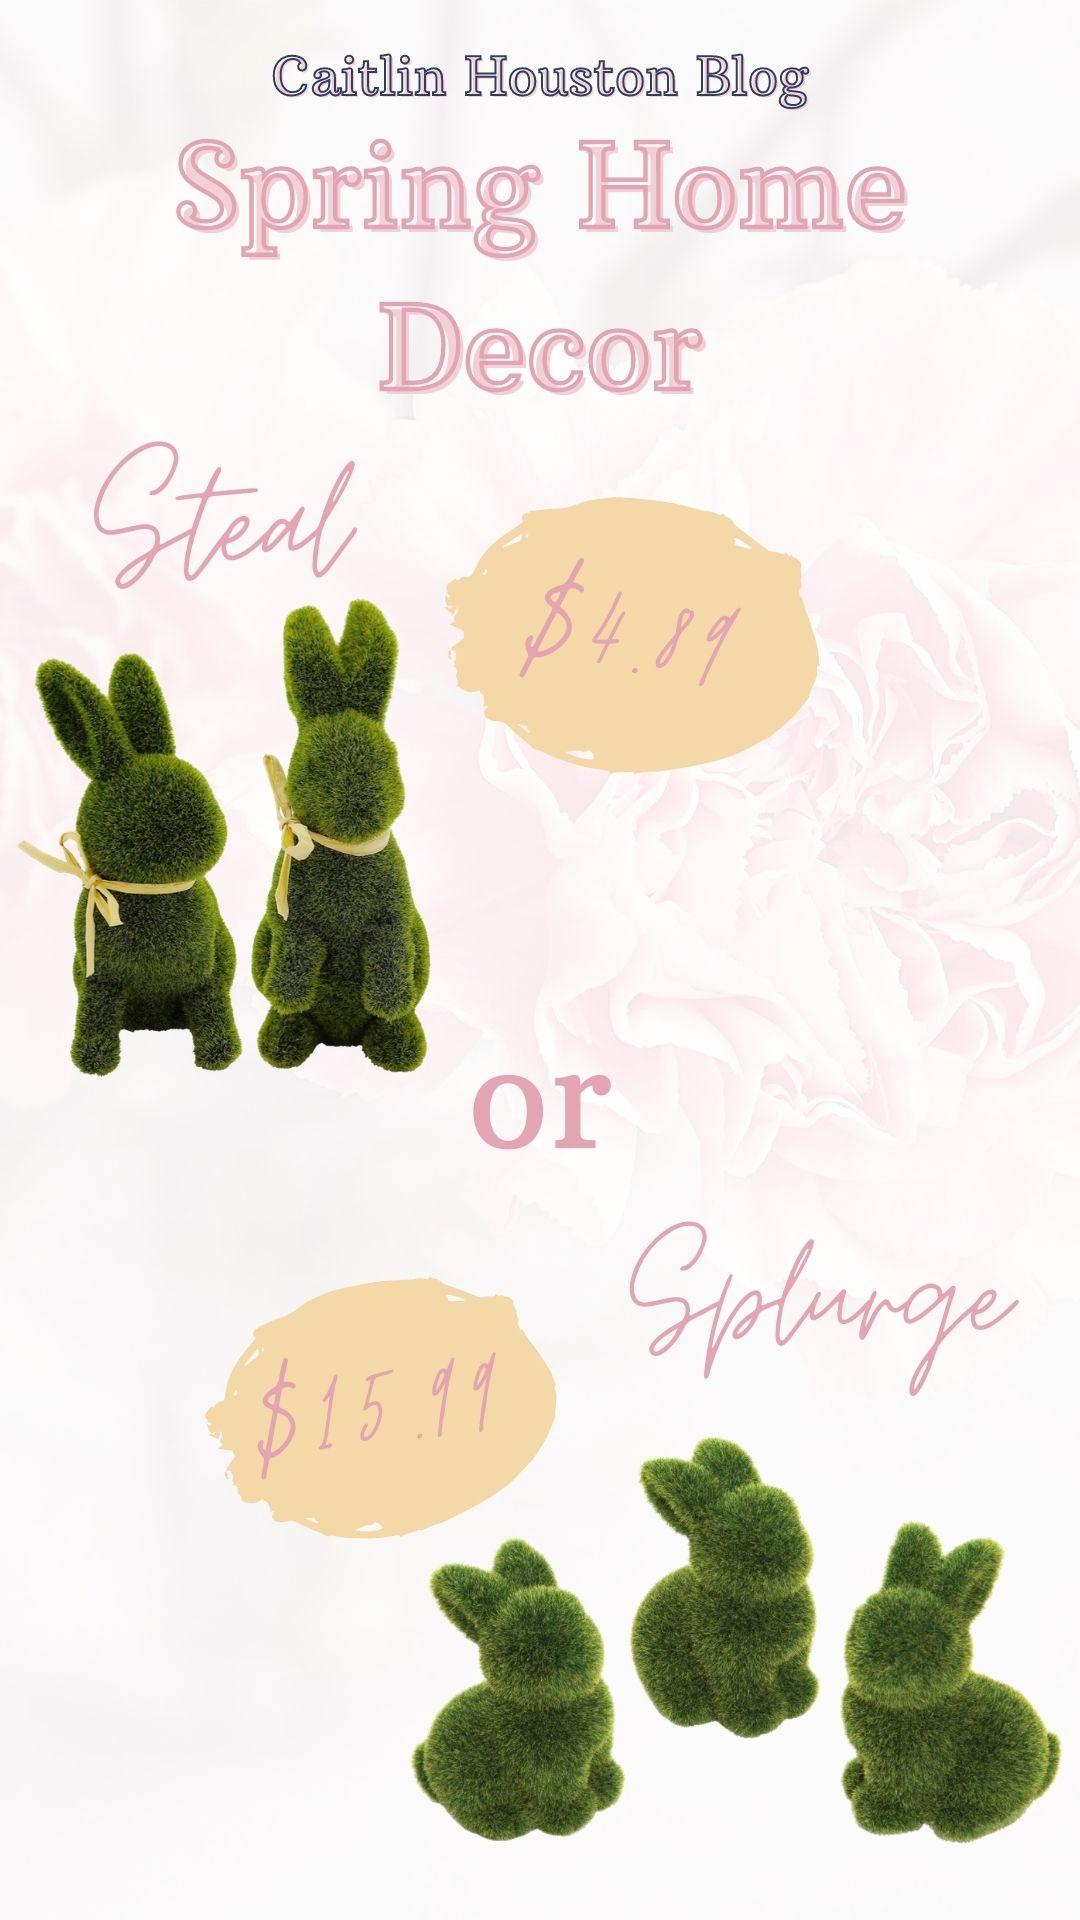 Spring Home Decor Steal or Splurge